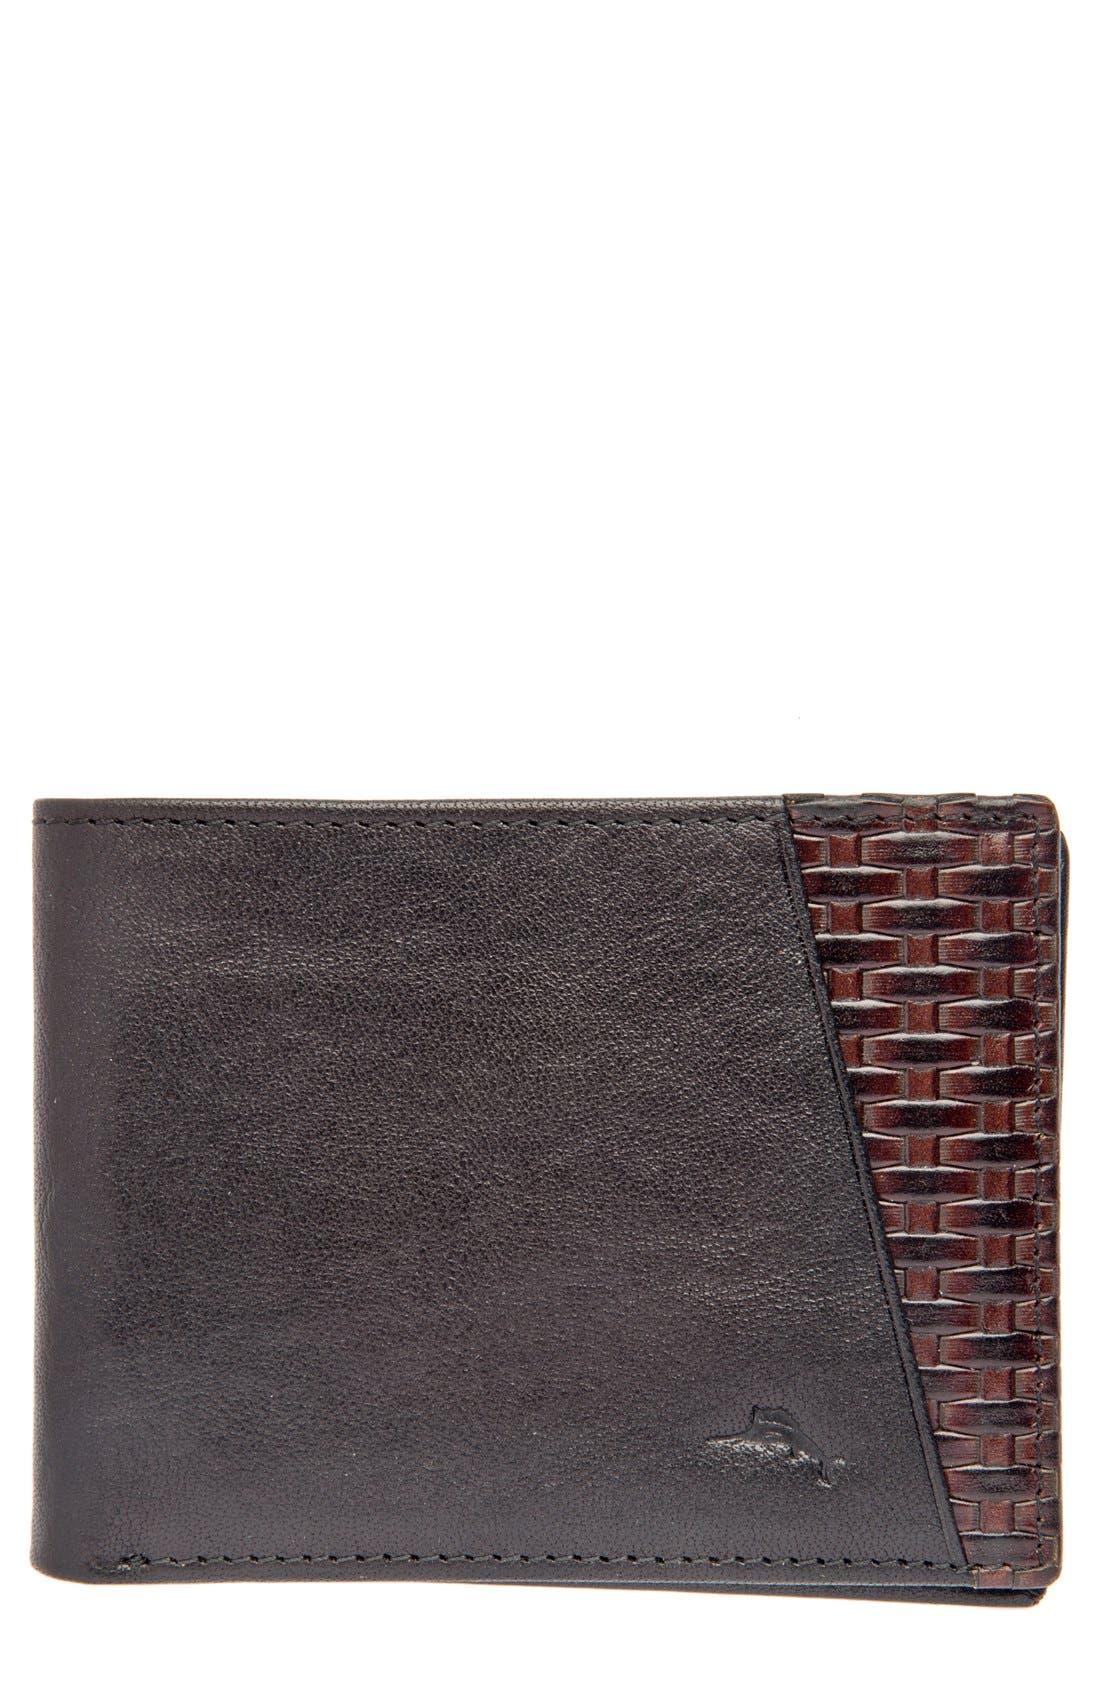 Alternate Image 1 Selected - Tommy Bahama 'Basketweave' Leather Wallet